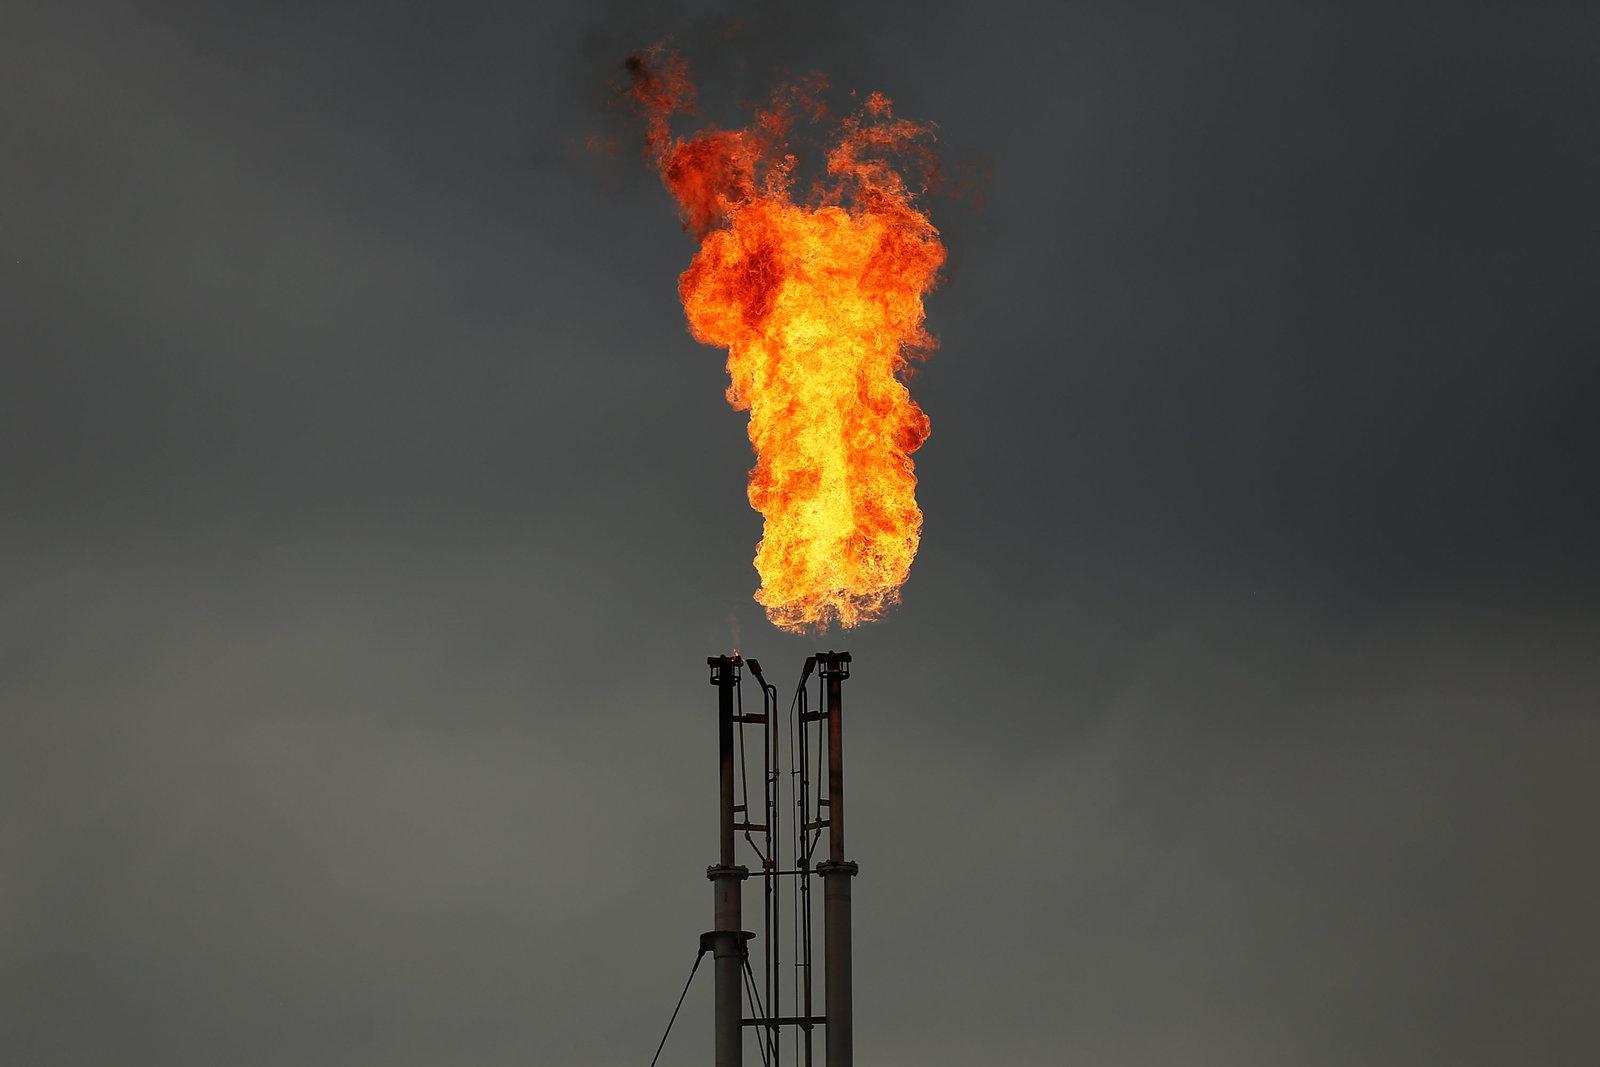 Flaring at a natural gas facility in Cuero, Texas